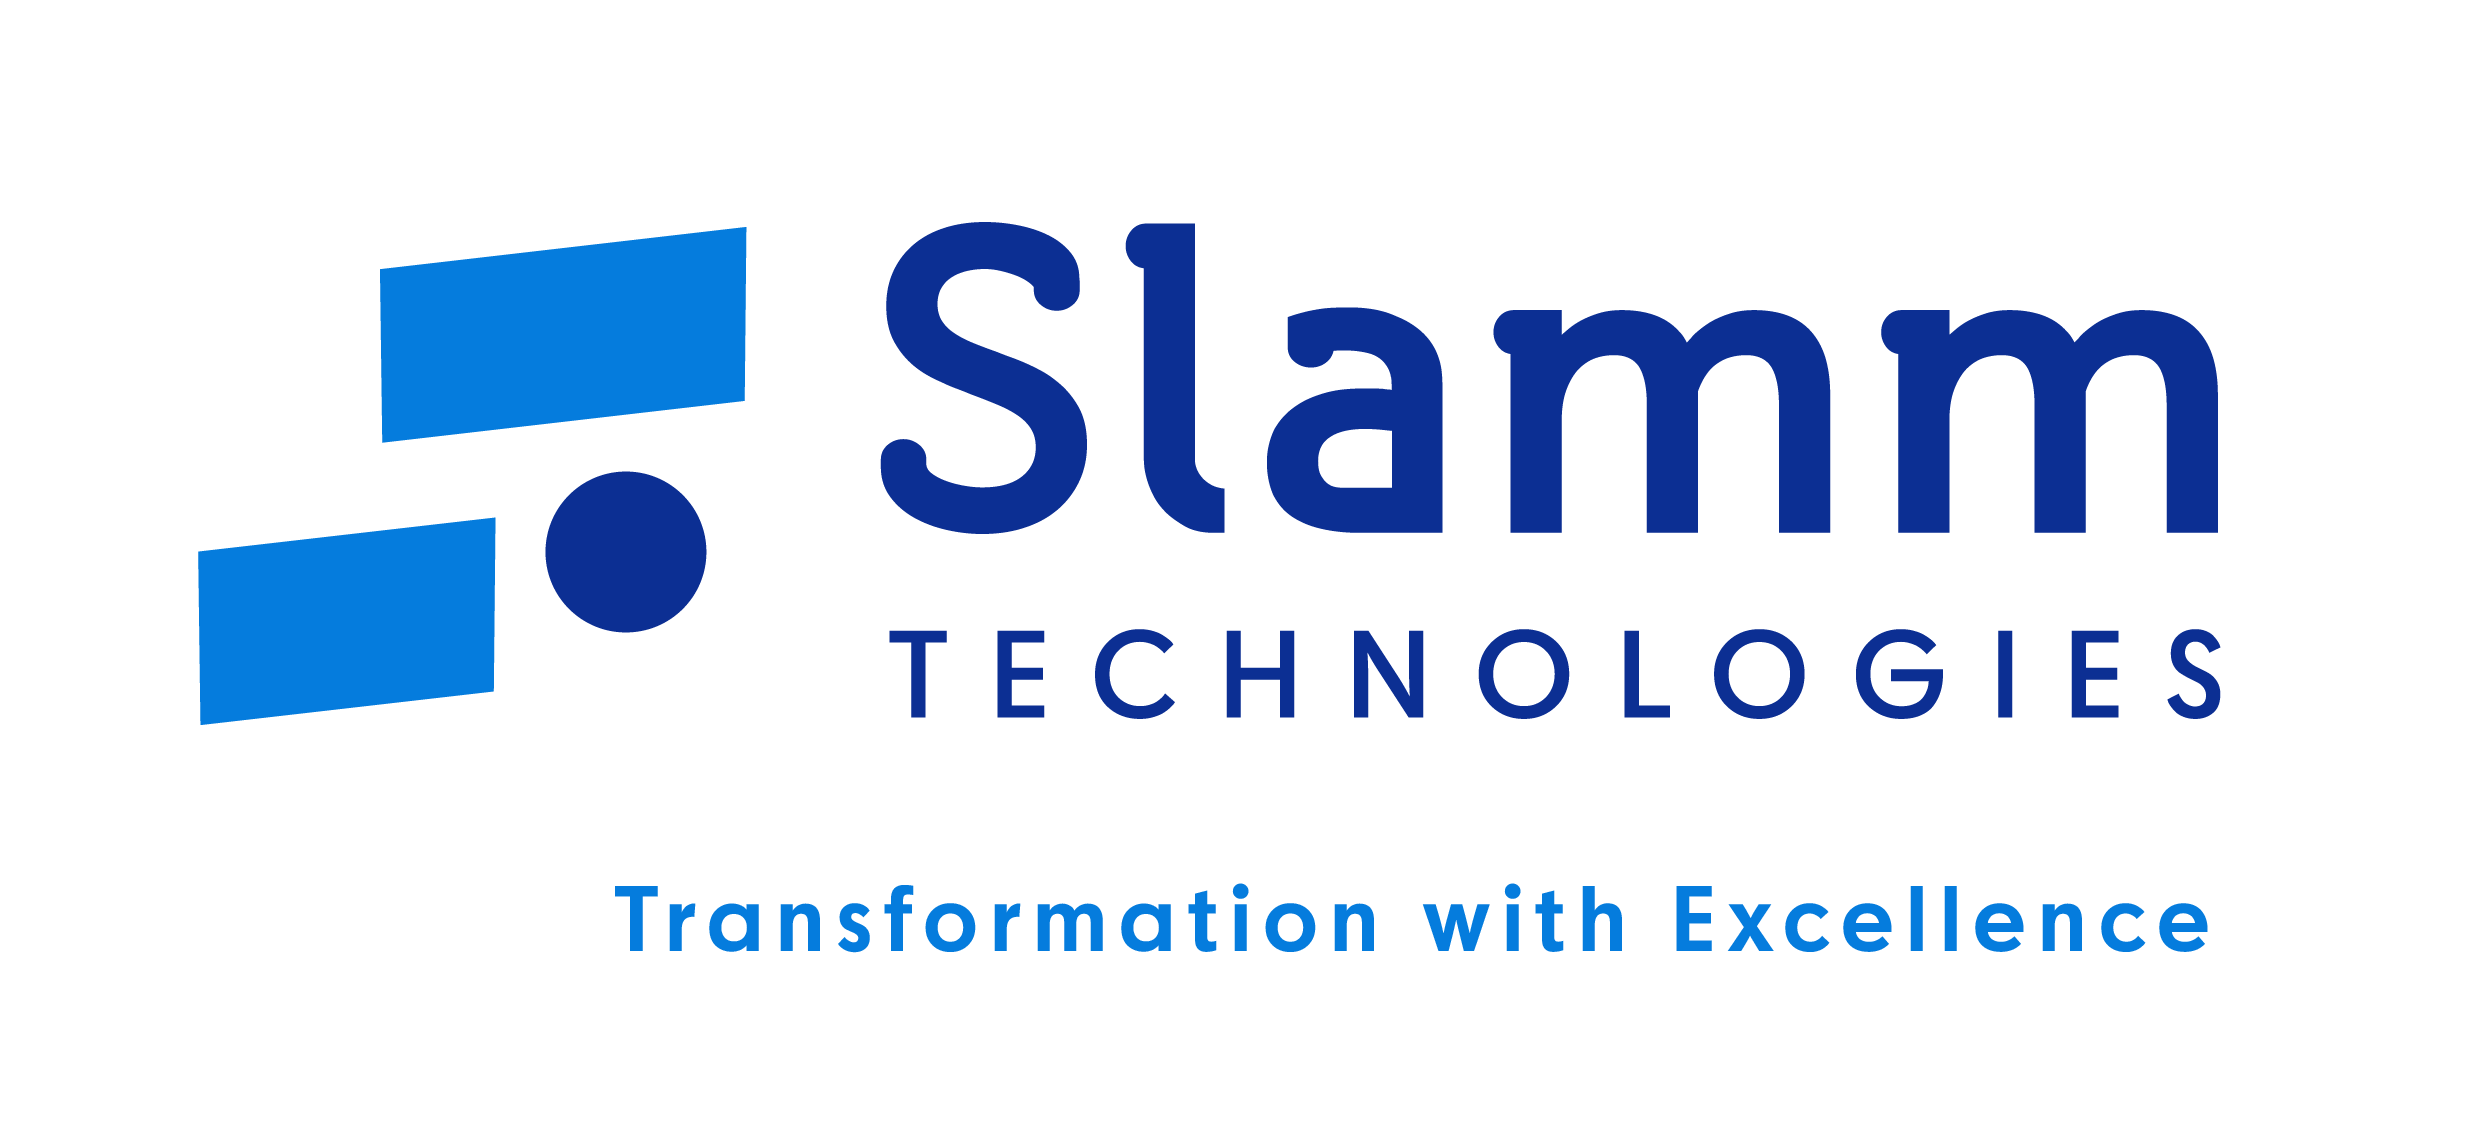 Slamm technologies logo in blue and navy